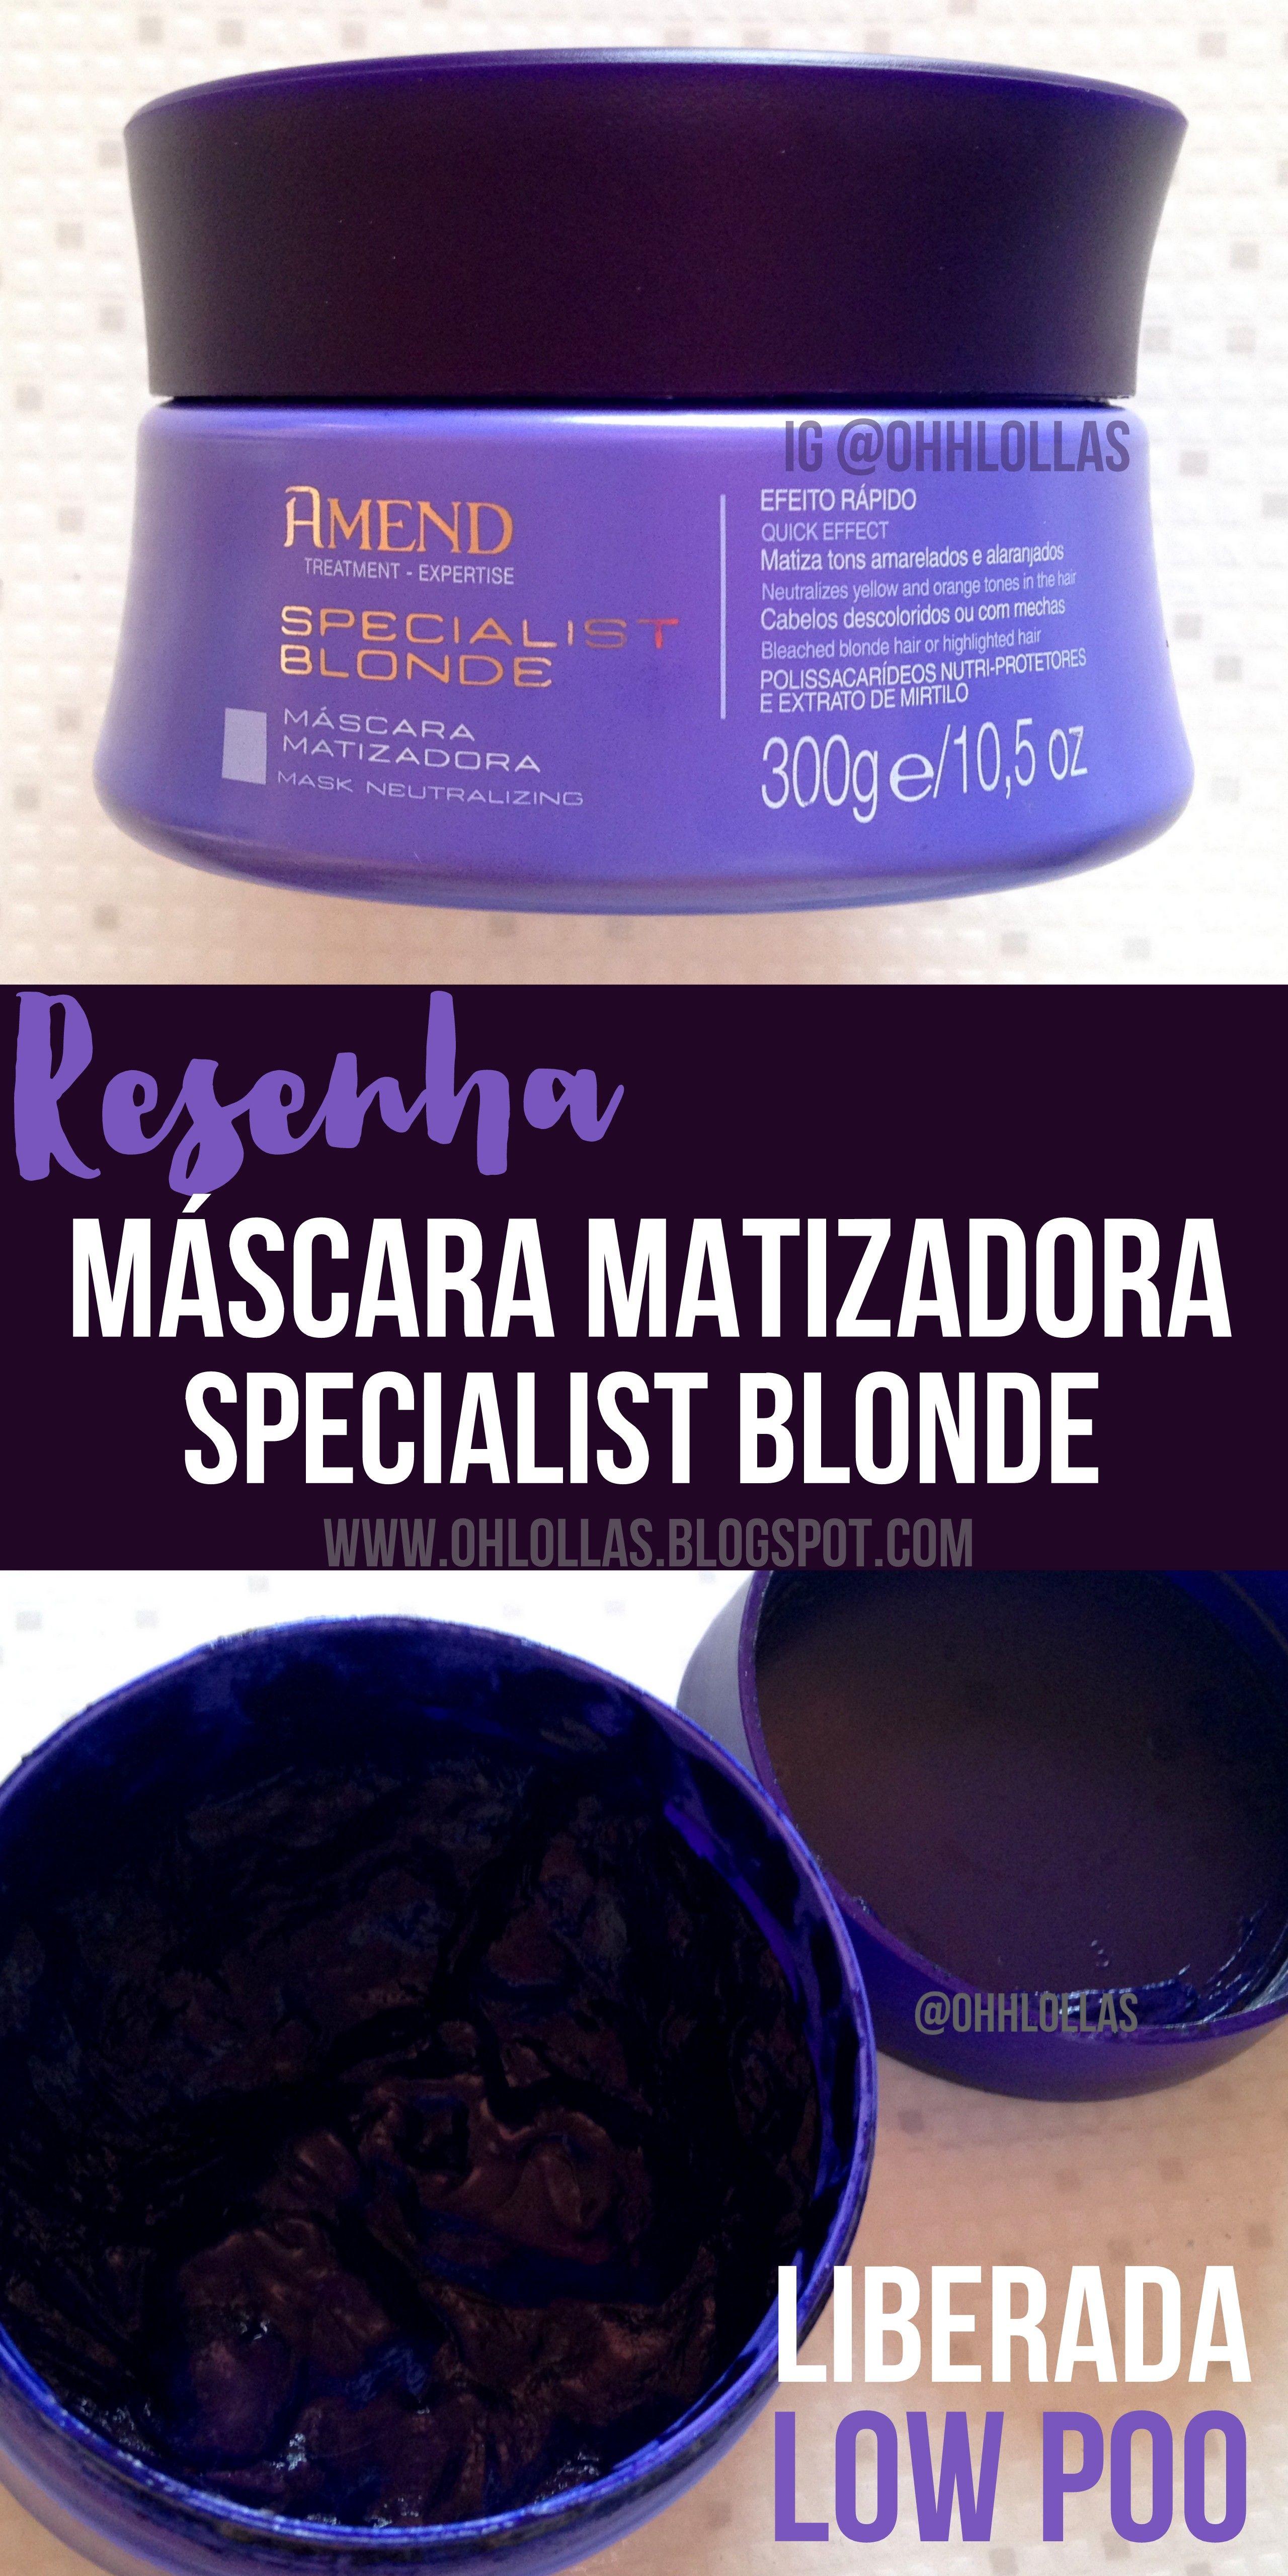 Resenha Mascara Matizadora Specialist Blonde Amend Matizar